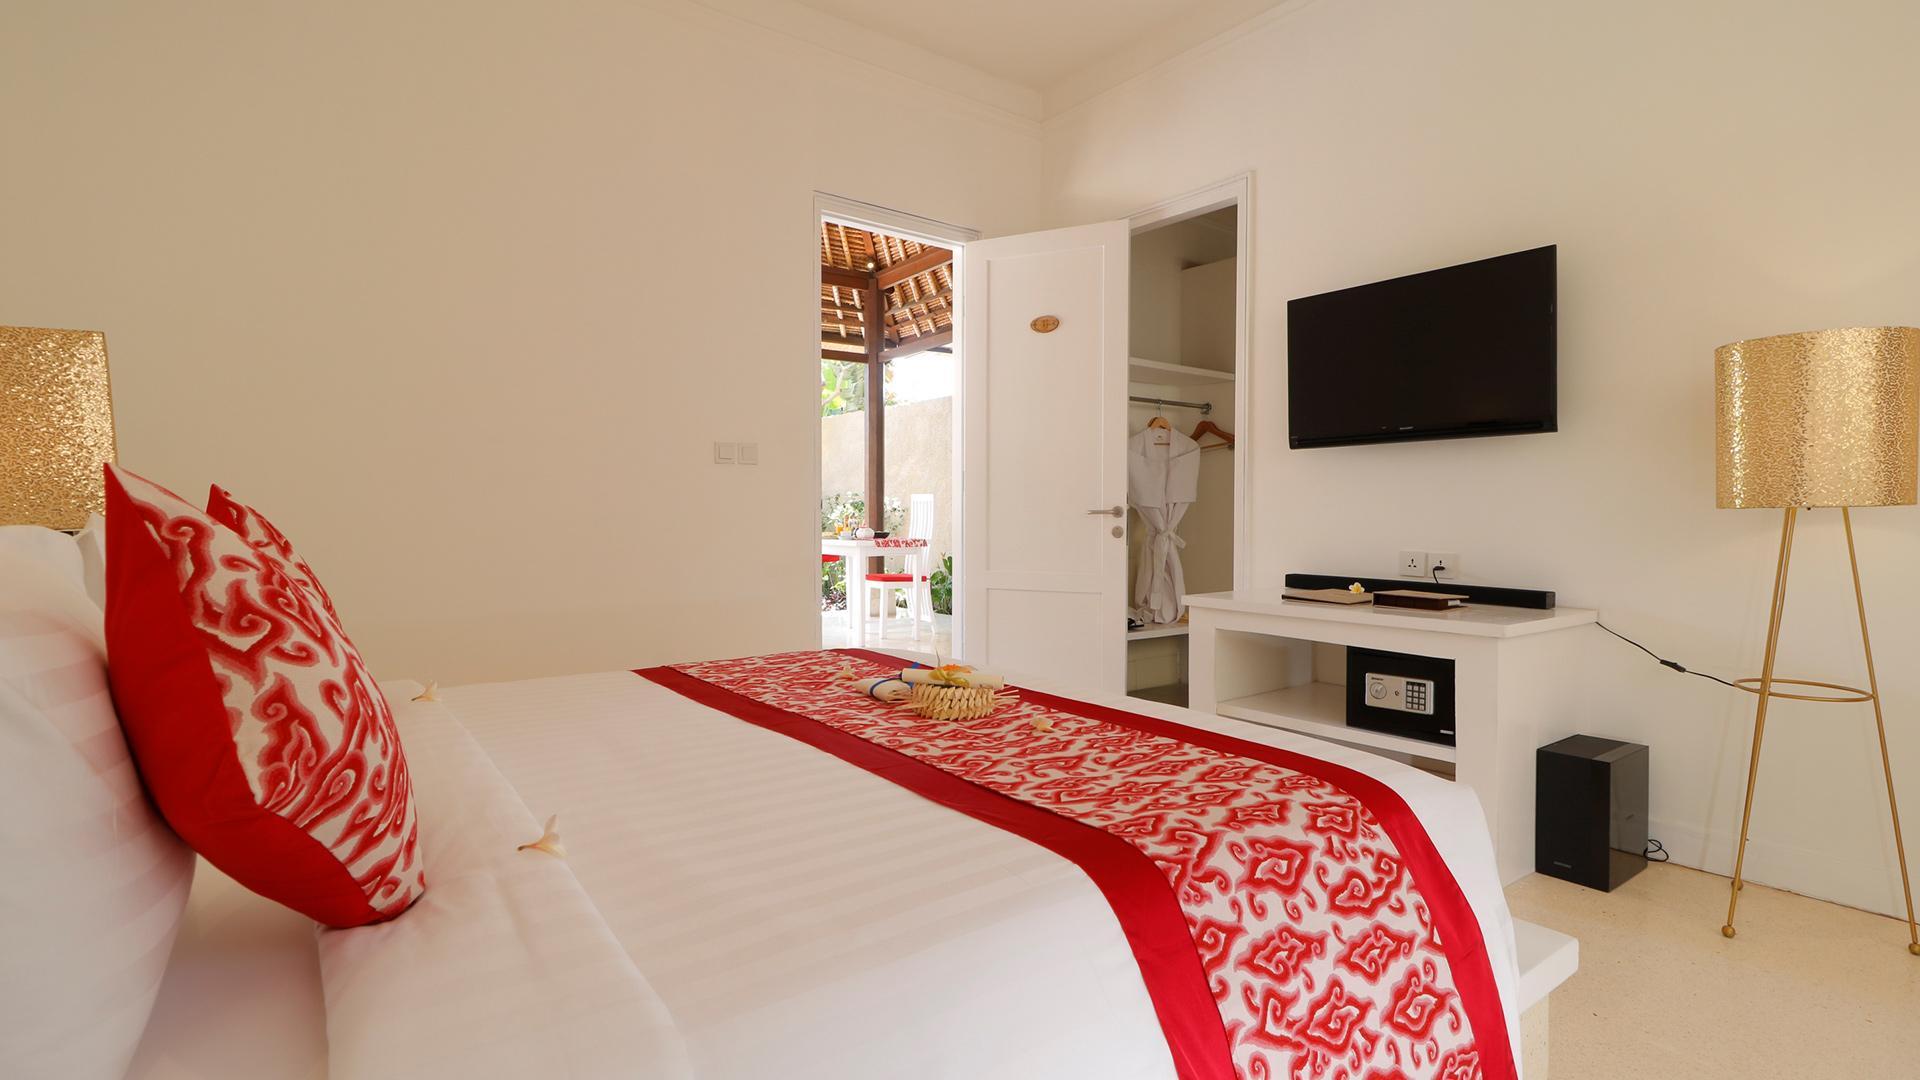 One Bedroom Pool Villa image 1 at Alam Boutique Resort 2019 by Kabupaten Badung, Bali, Indonesia